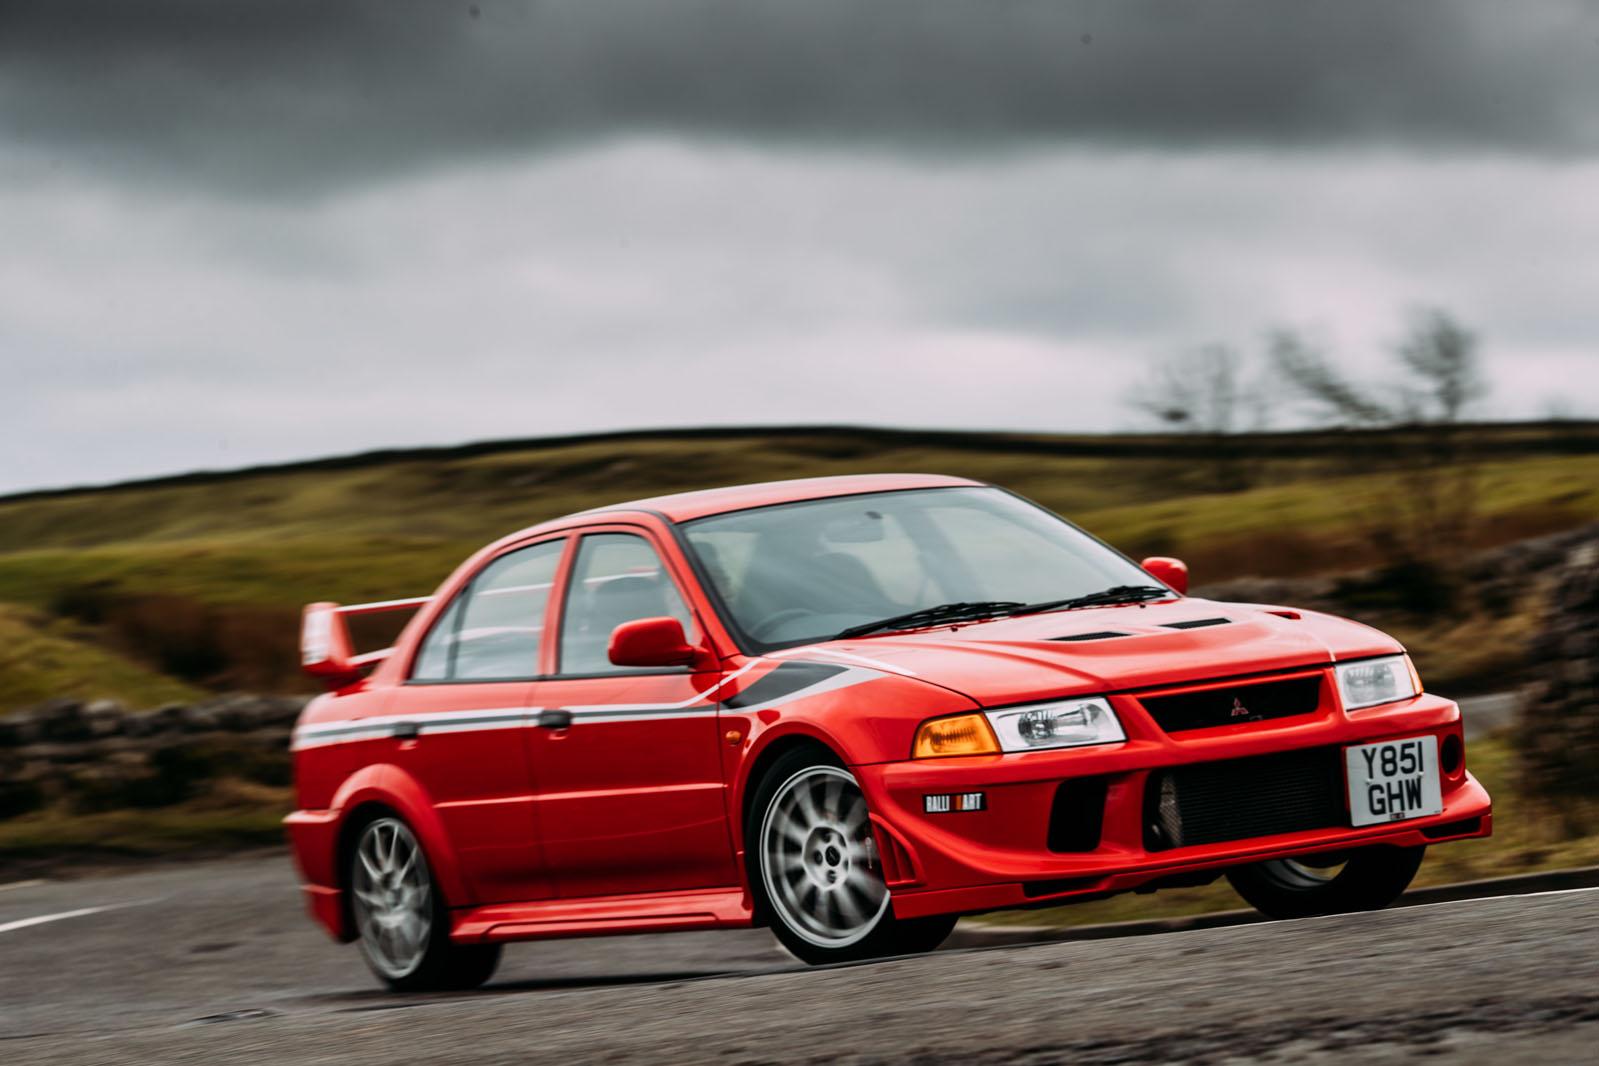 Wheels Up Cost Per Hour >> Rally legends twin test: Mitsubishi Lancer Evo VI Makinen vs Subaru Impreza 22B | Autocar